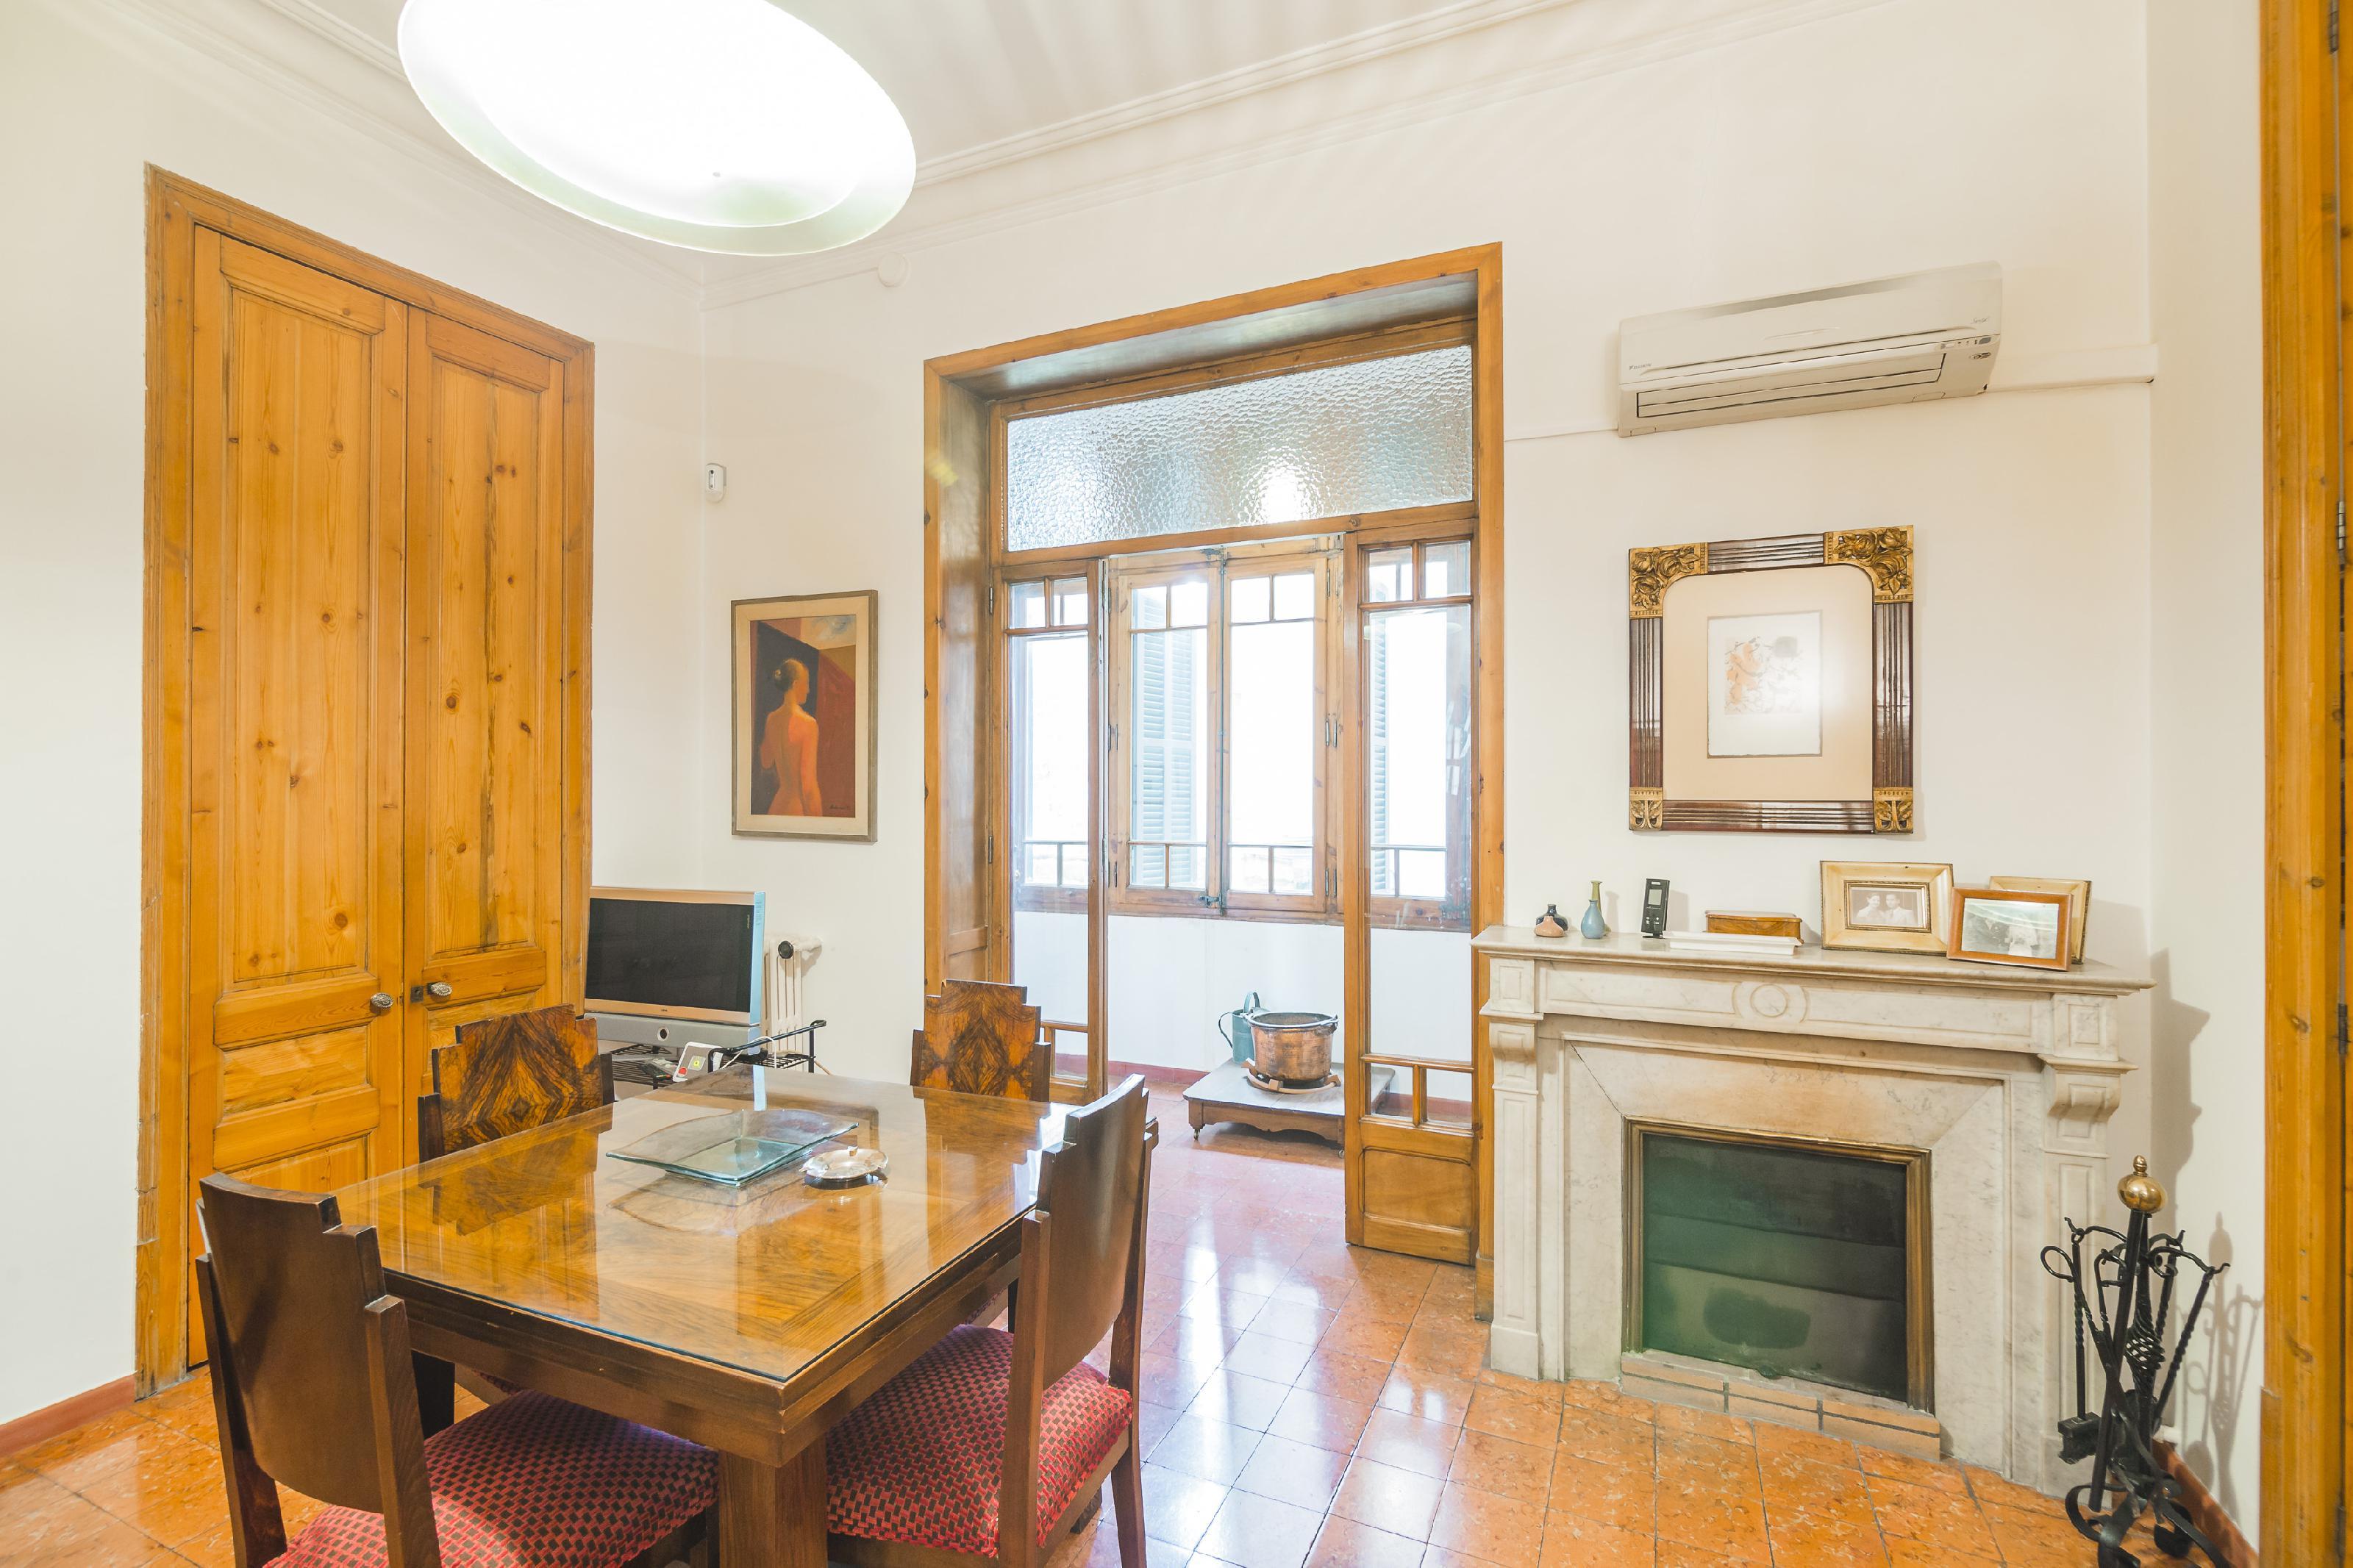 250020 Piso en venda en Gràcia, Vila de Gràcia 17